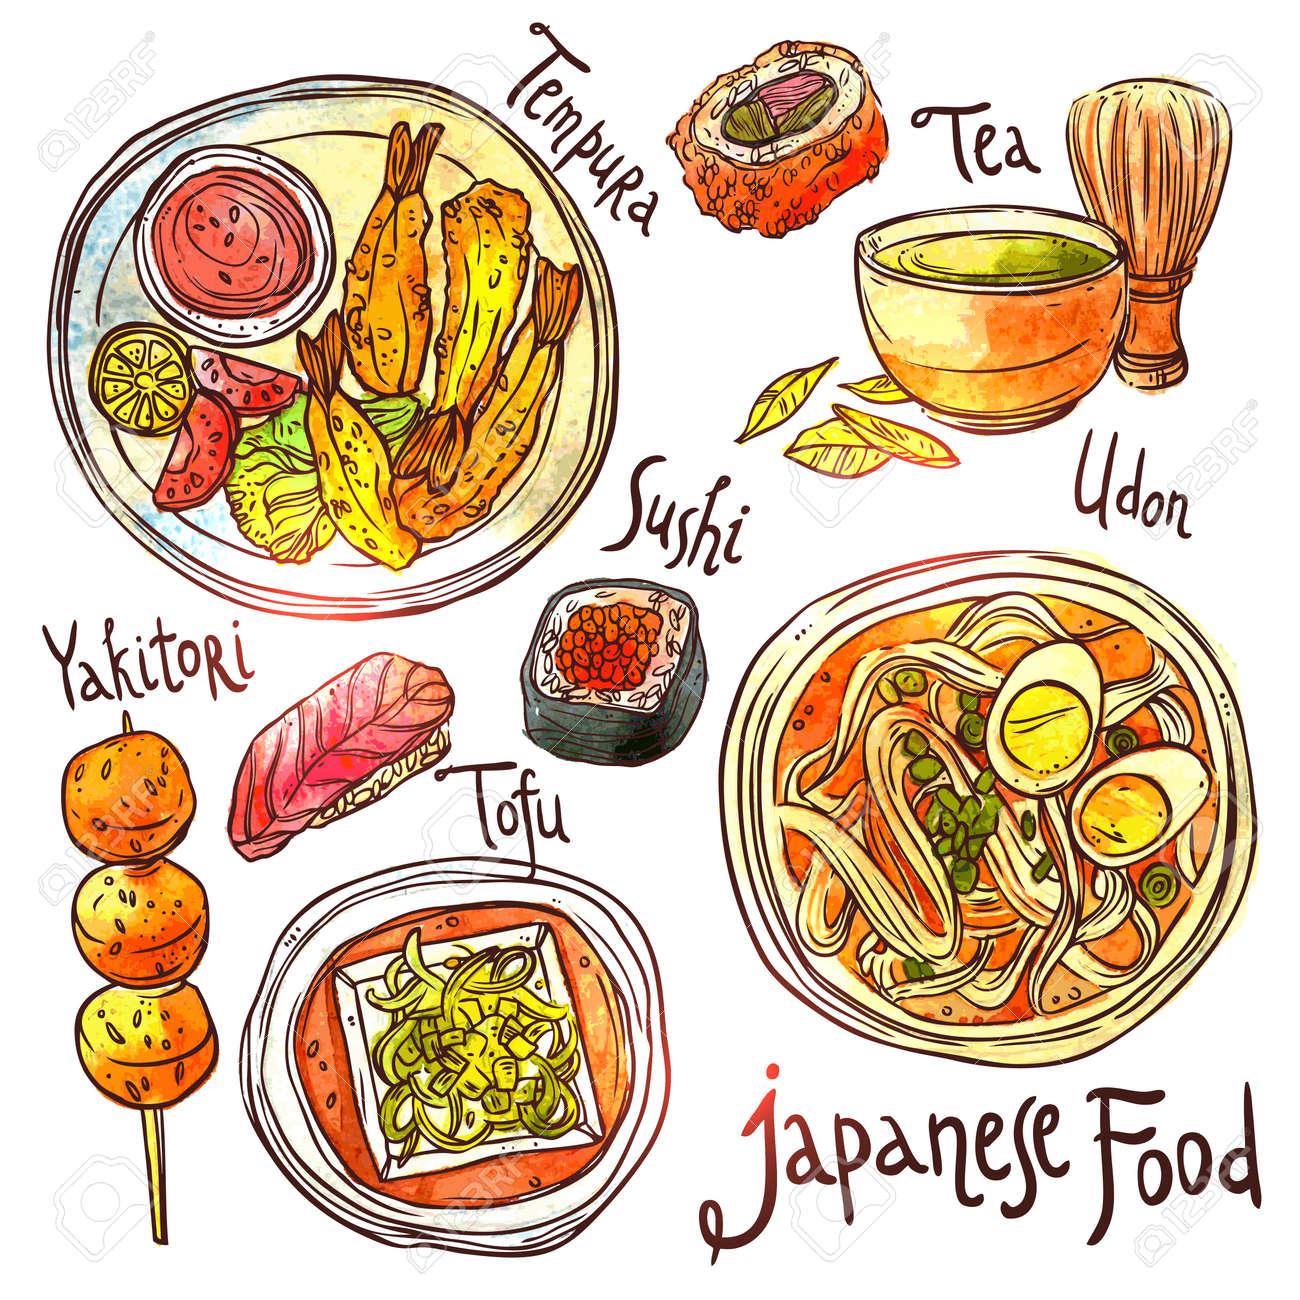 Cuisine Illustration asian food, hand drawn watercolor illustration. japanese food